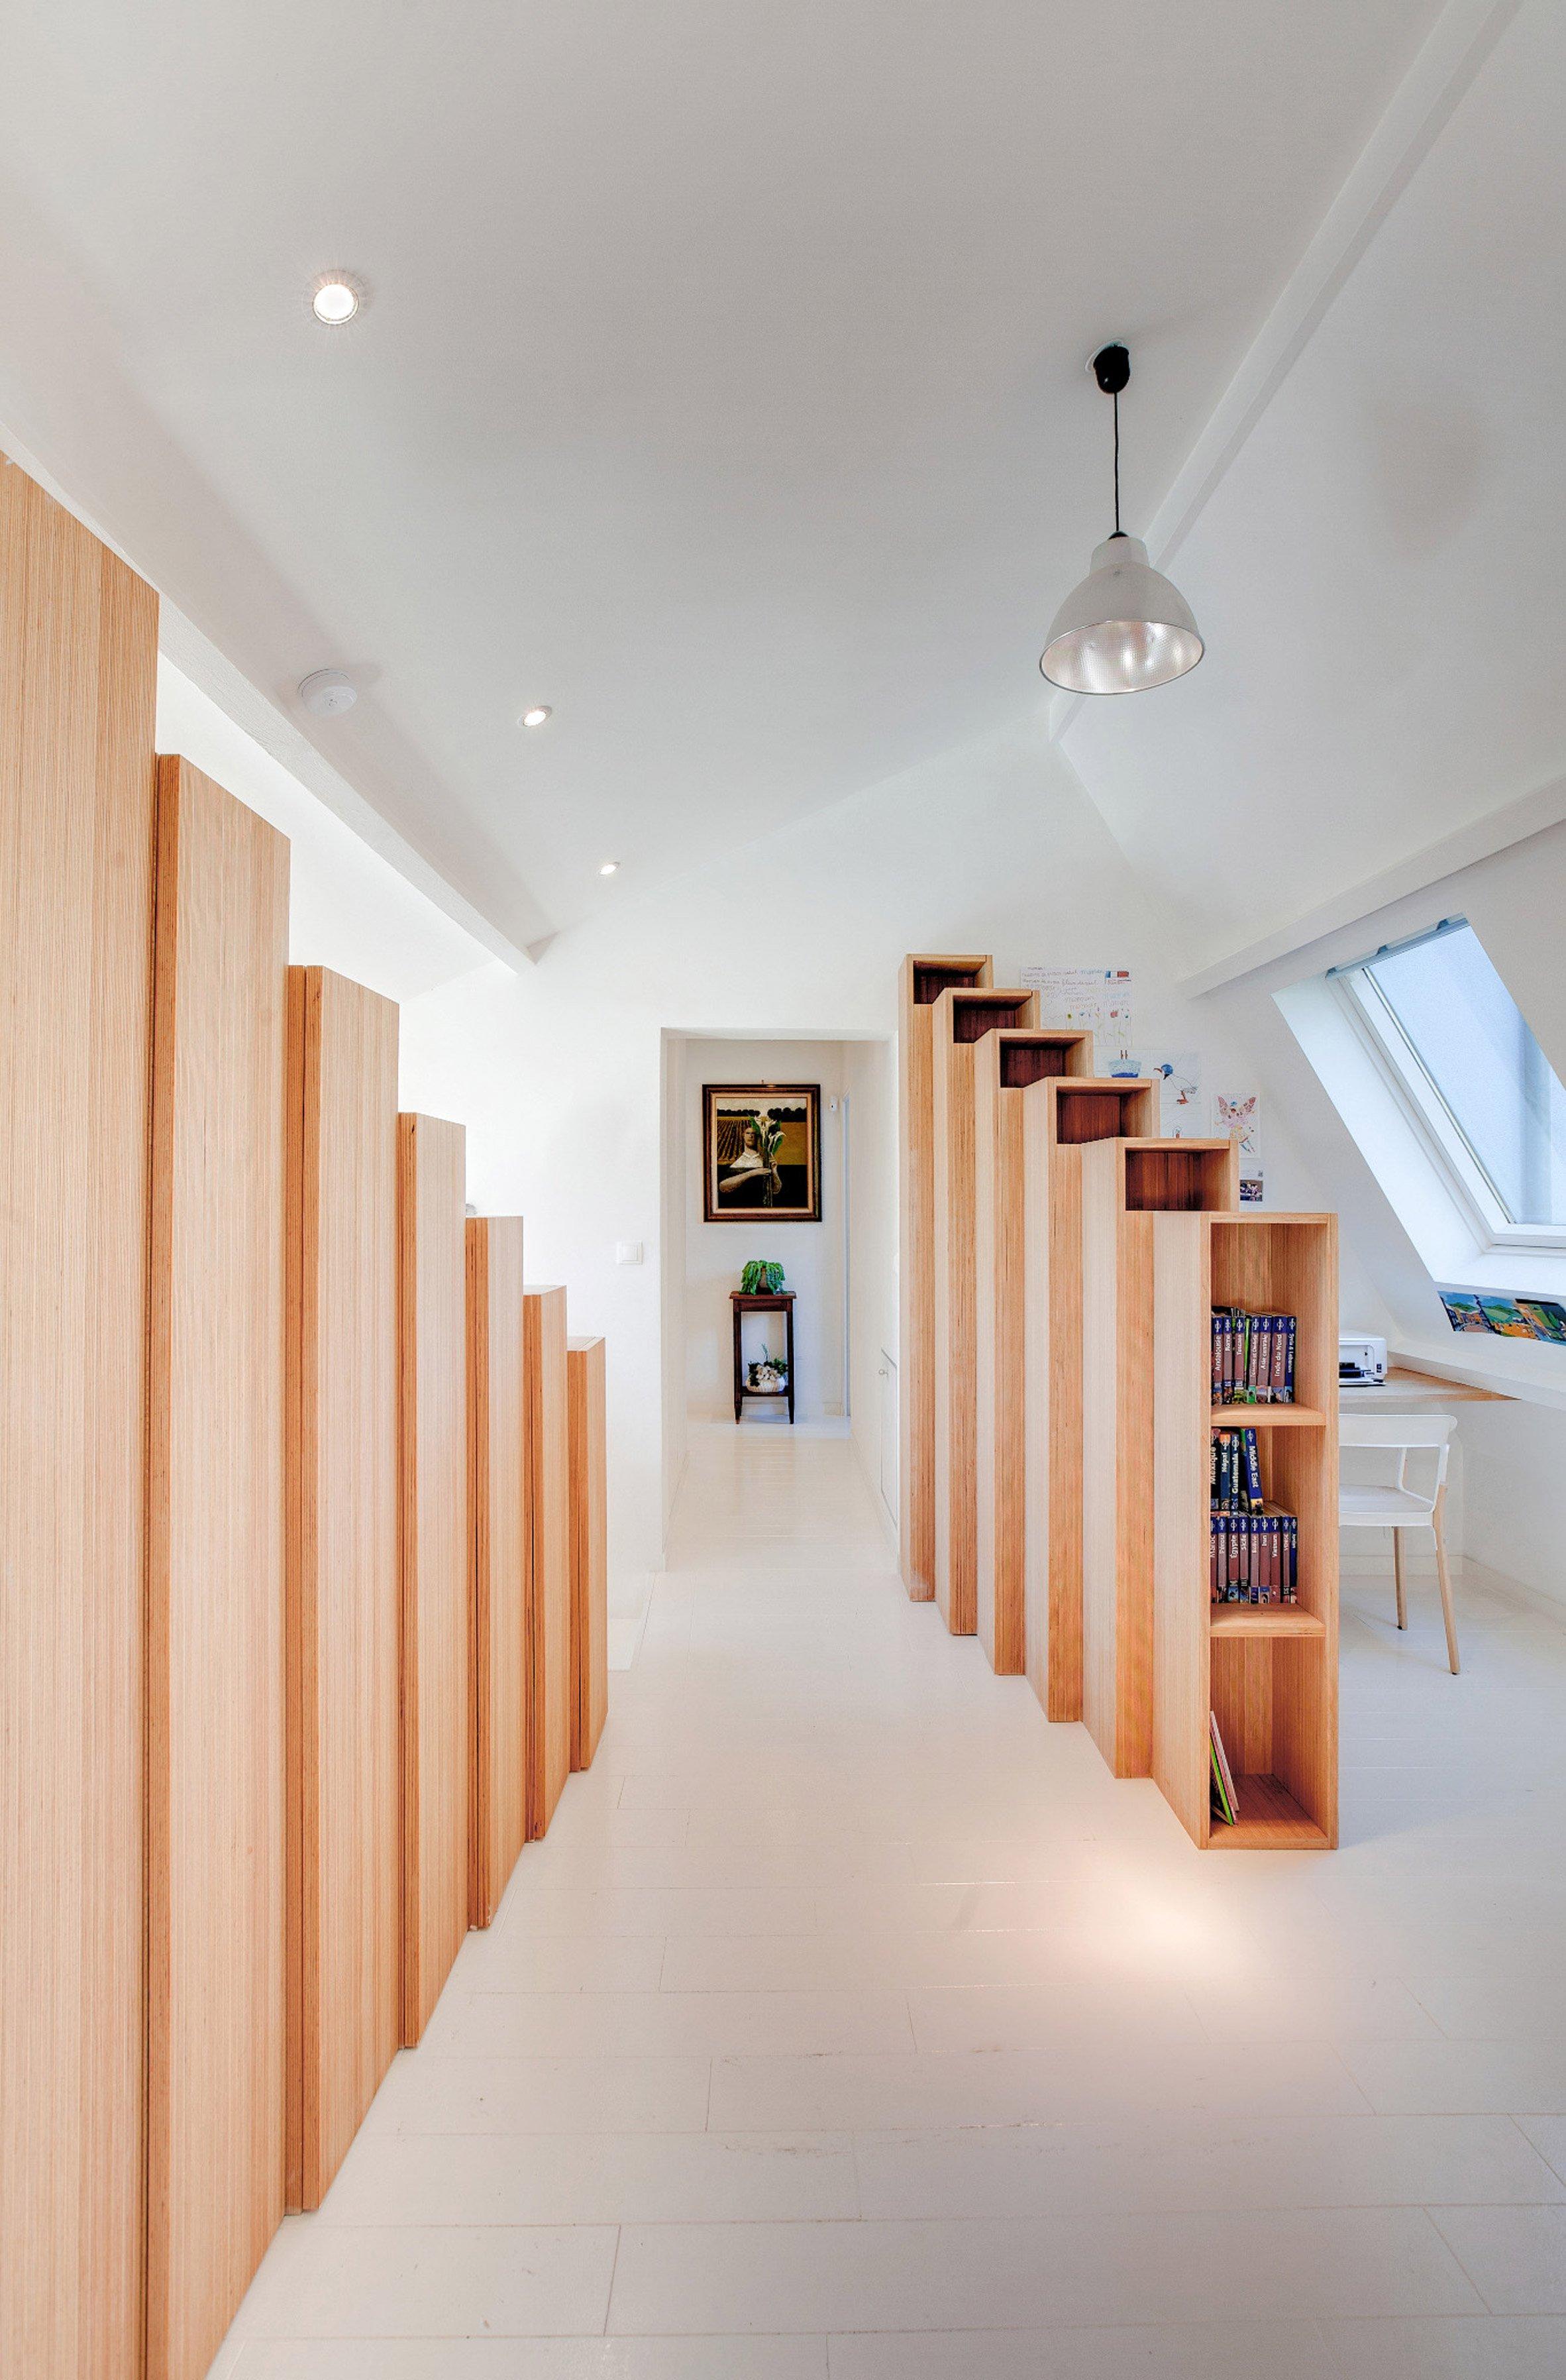 bookshelf-house-andrea-mosca-interior-paris-_dezeen_2364_col_3